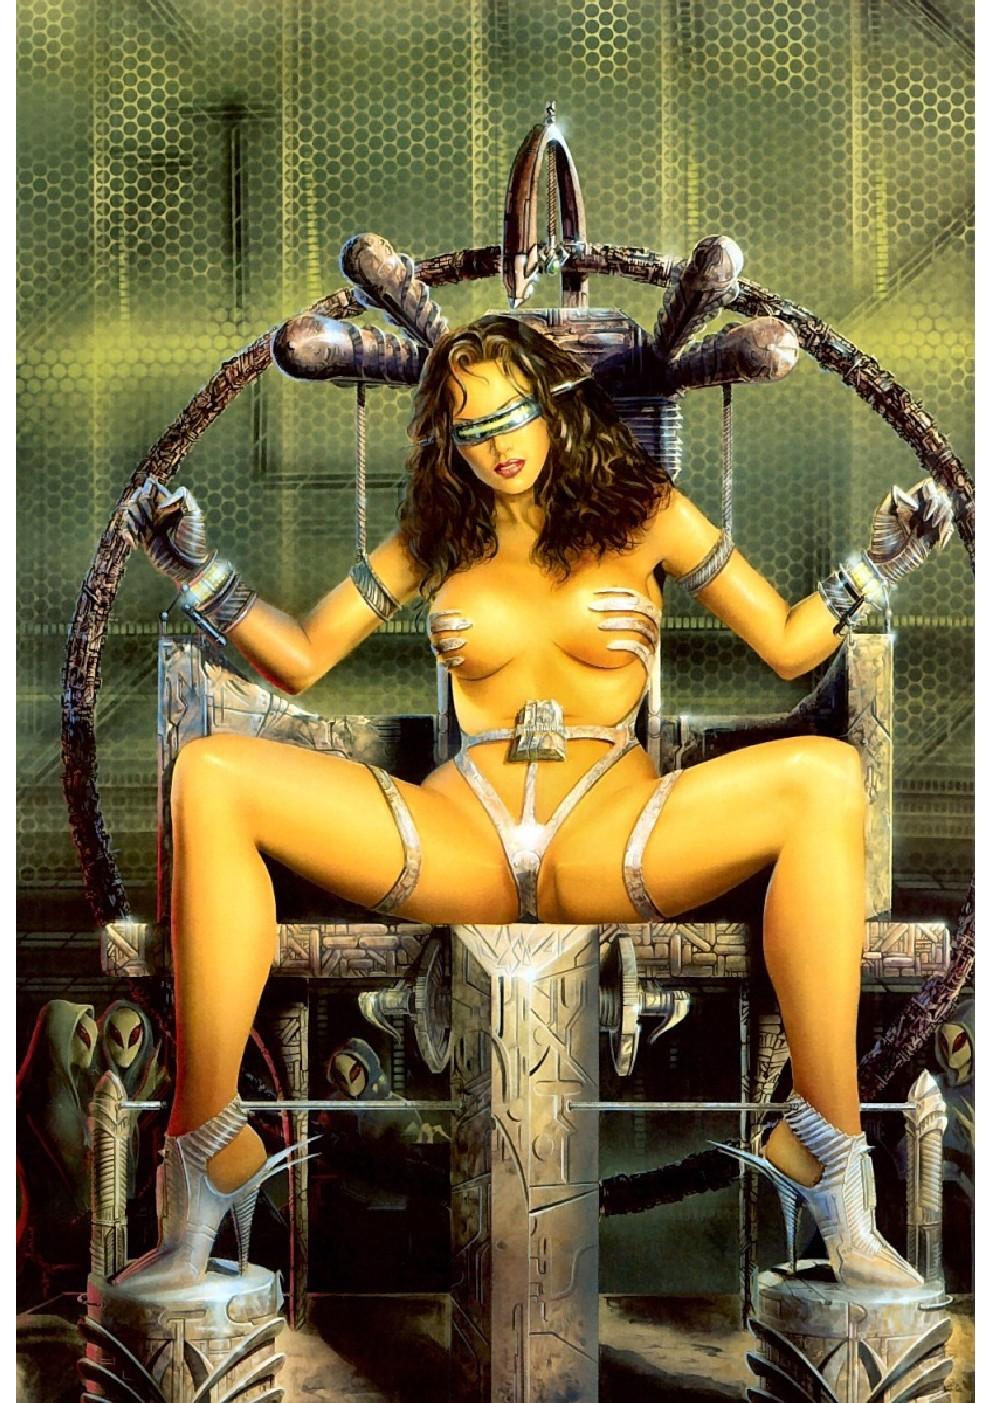 Amys fantasy erotic pic nsfw clip